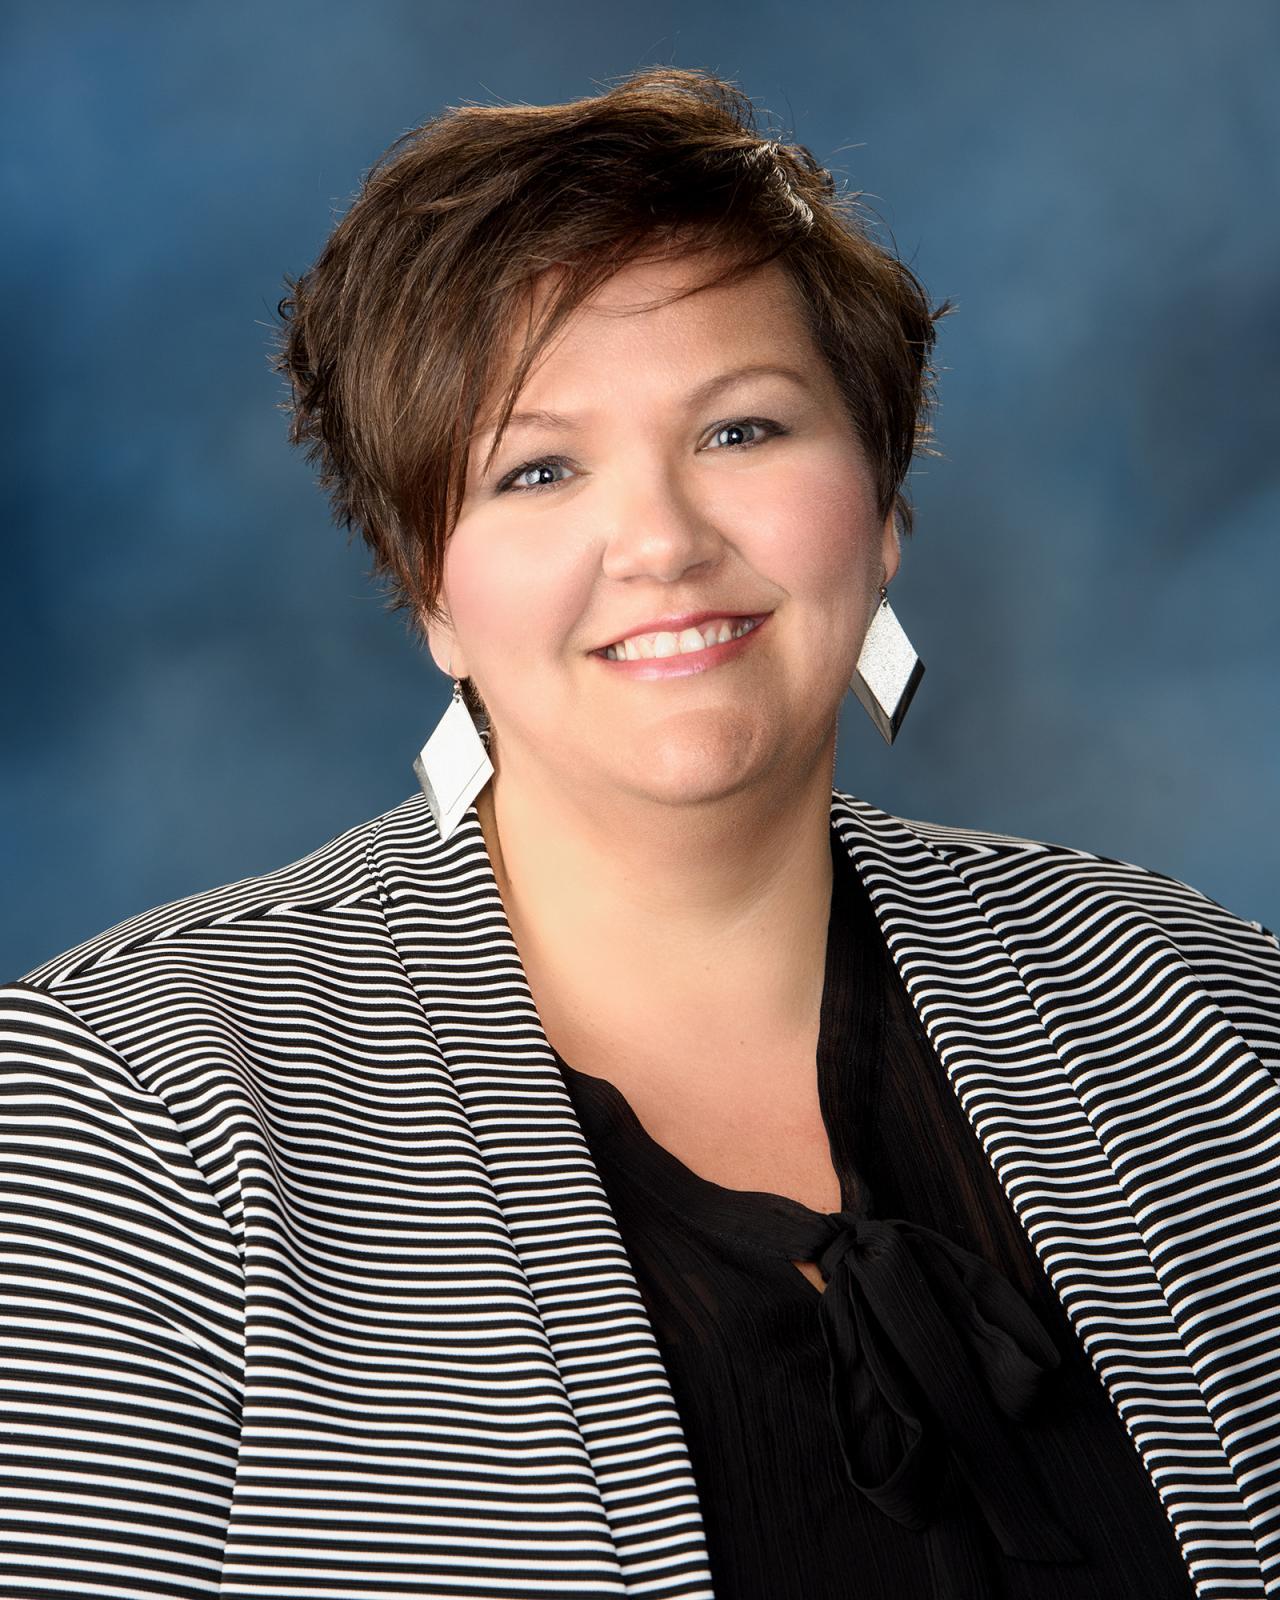 Conroe EDC Hires Sharla K. Smith as Administrative Assistant Main Photo